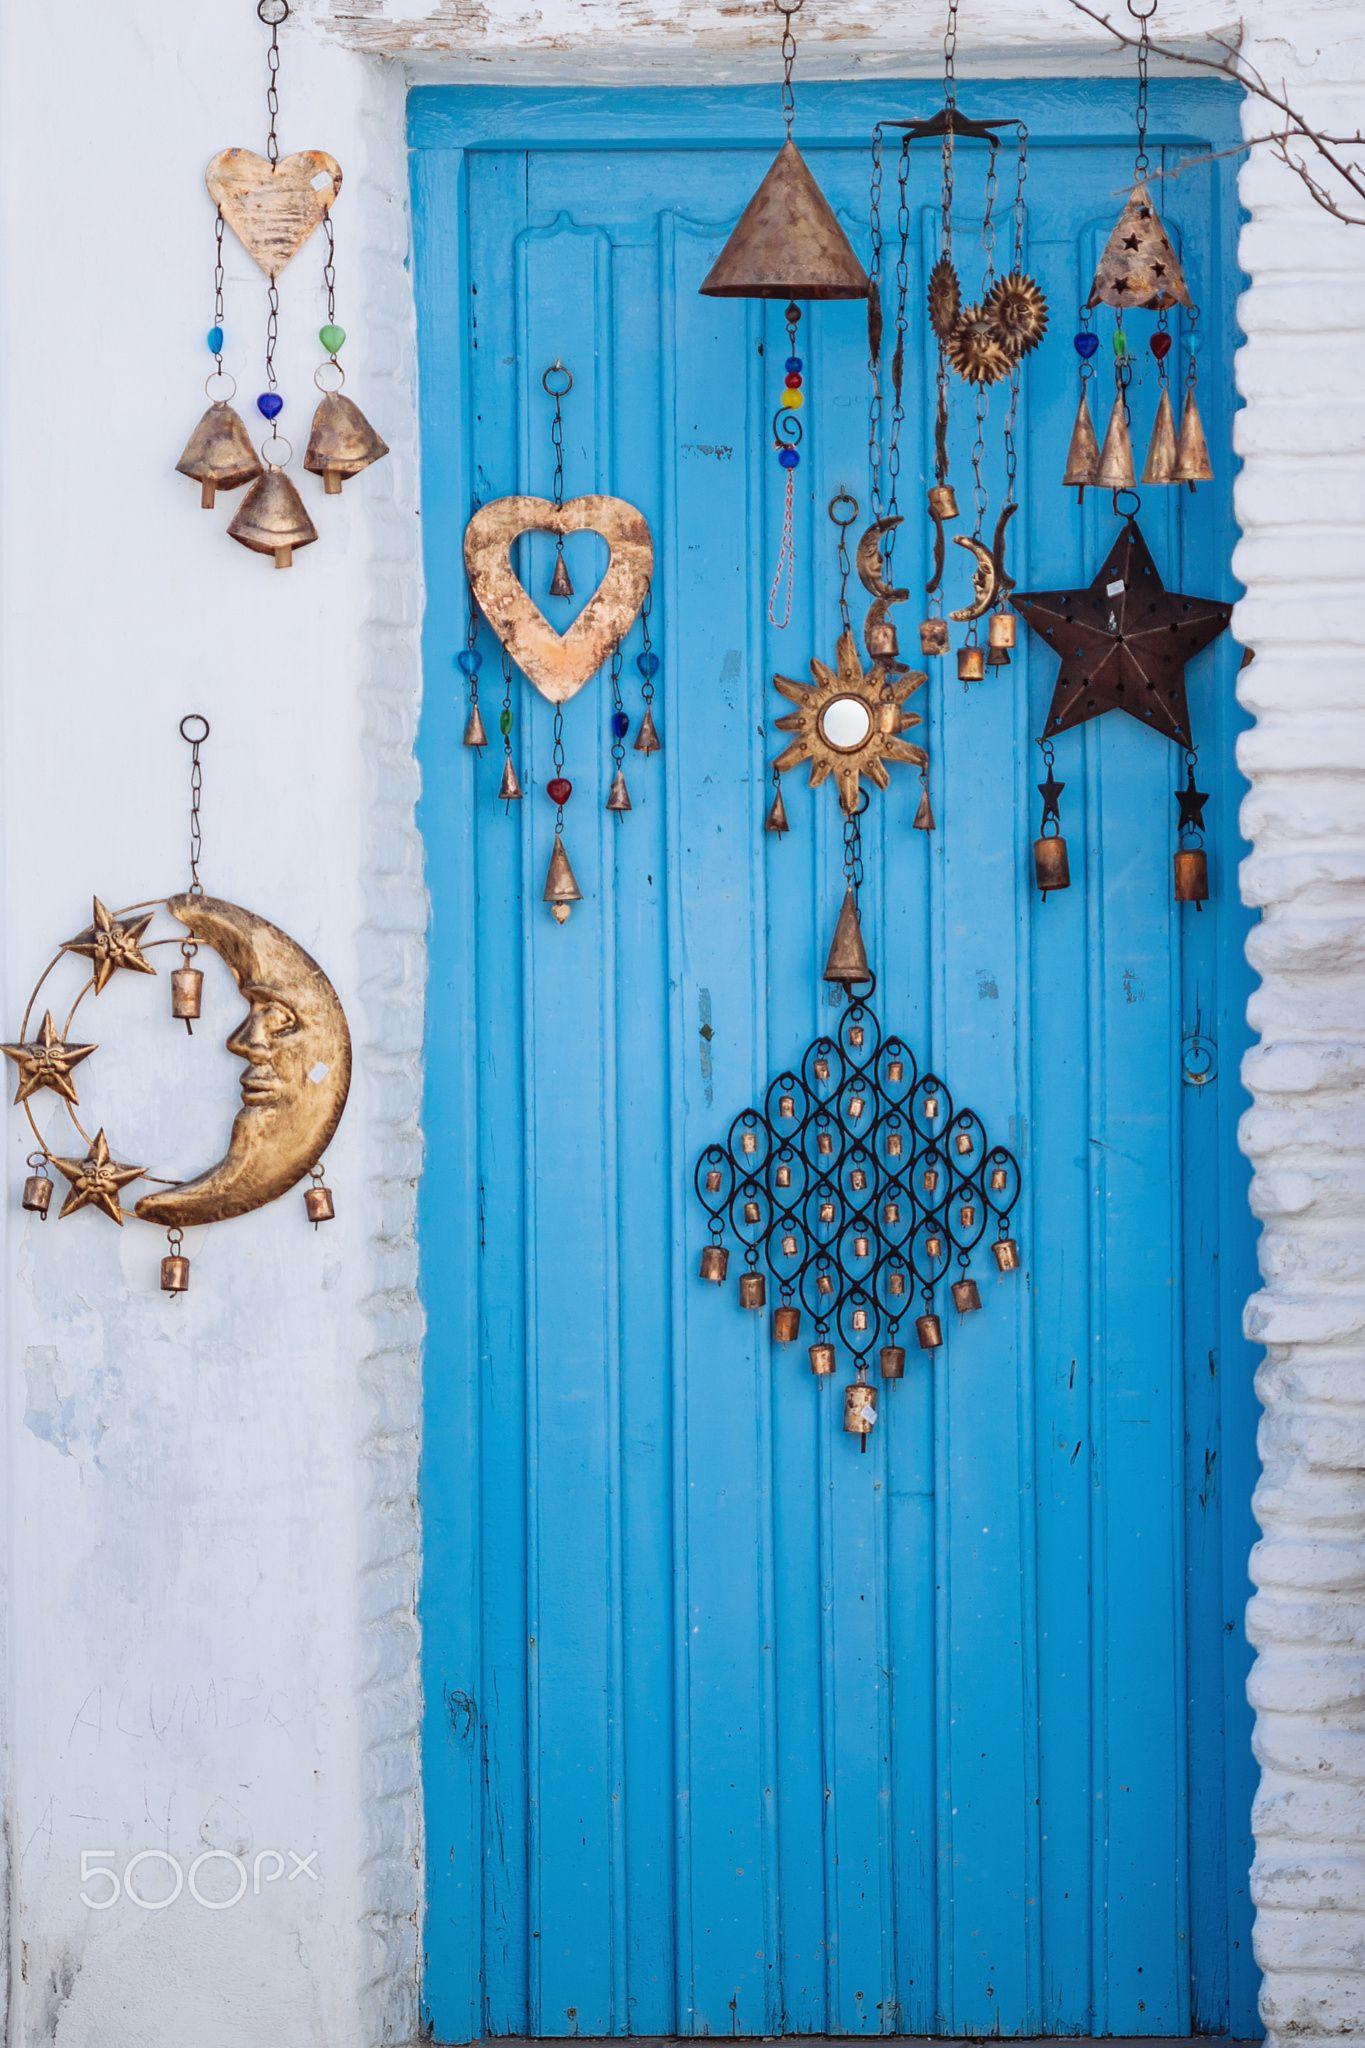 Magic Door, Santorini, Greece Más